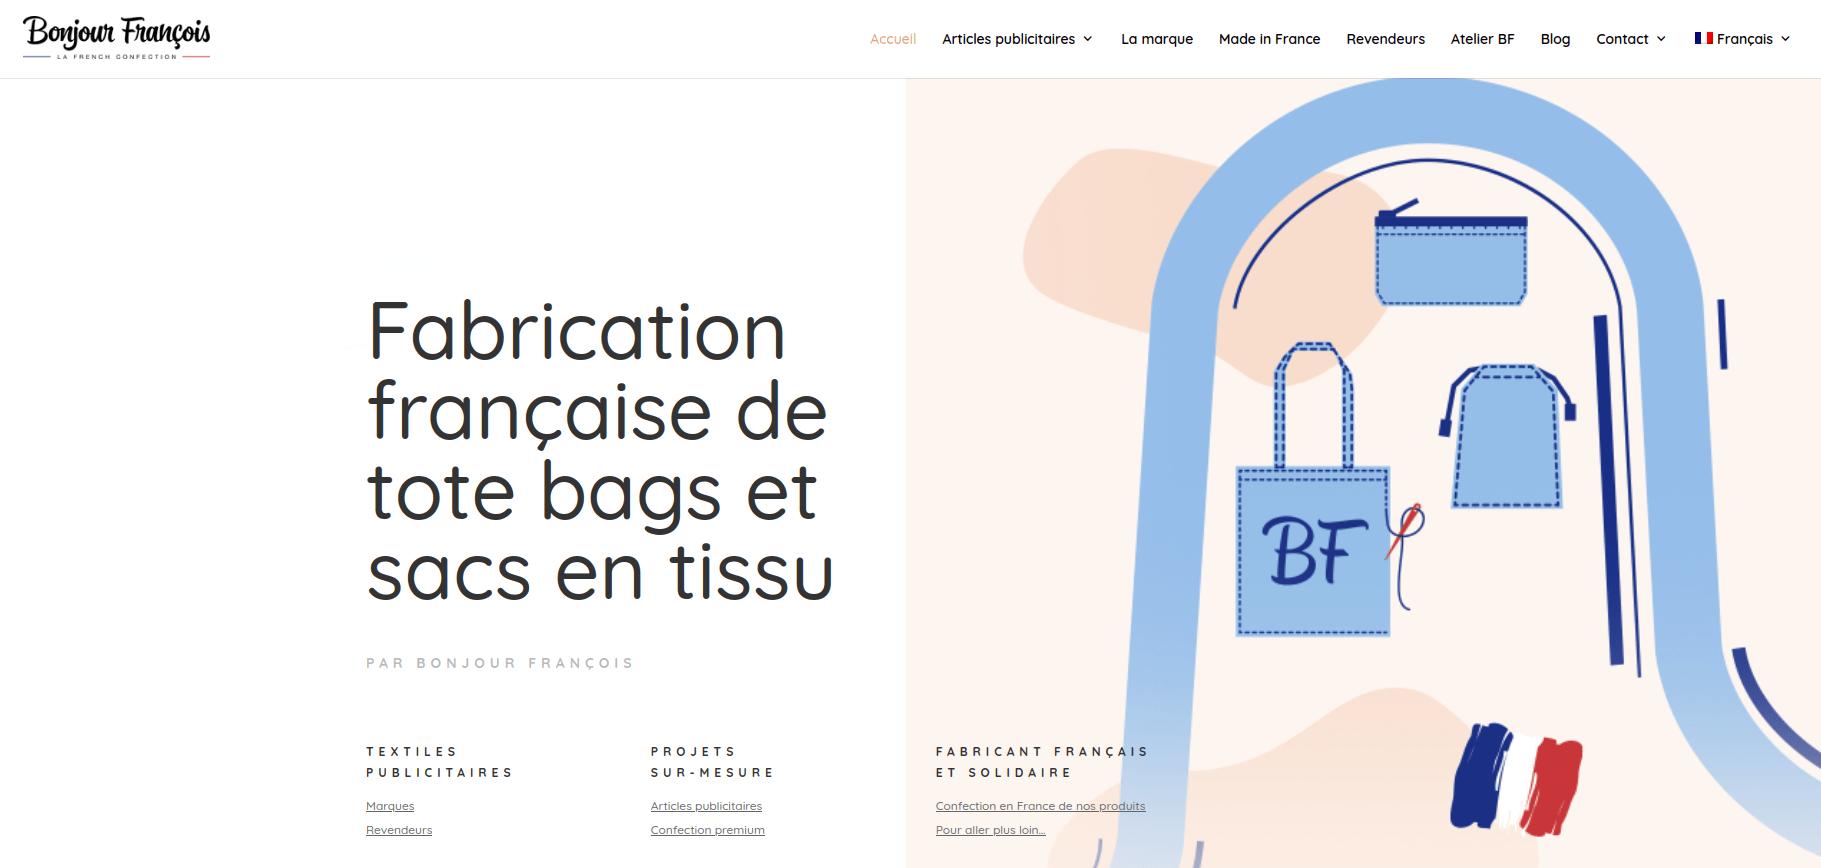 Site internet Bonjour François